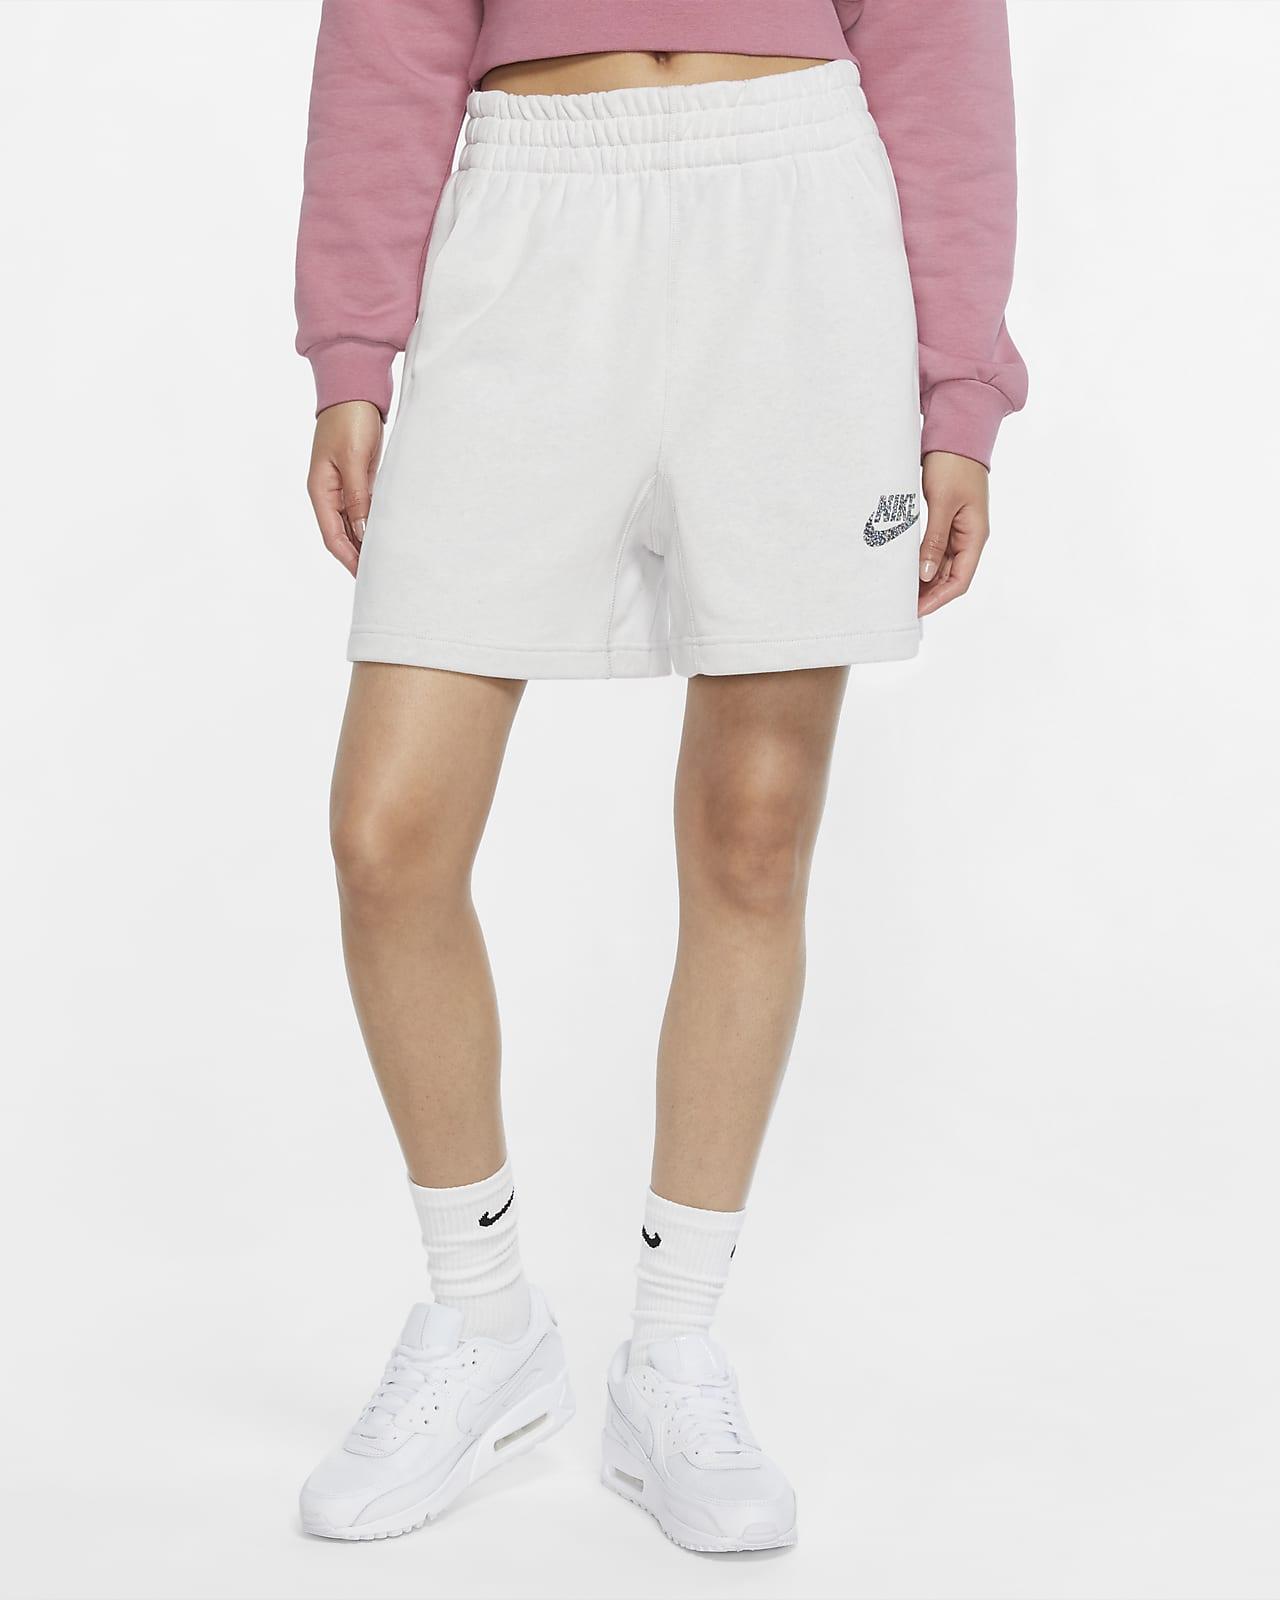 Nike sportswear shorts grey